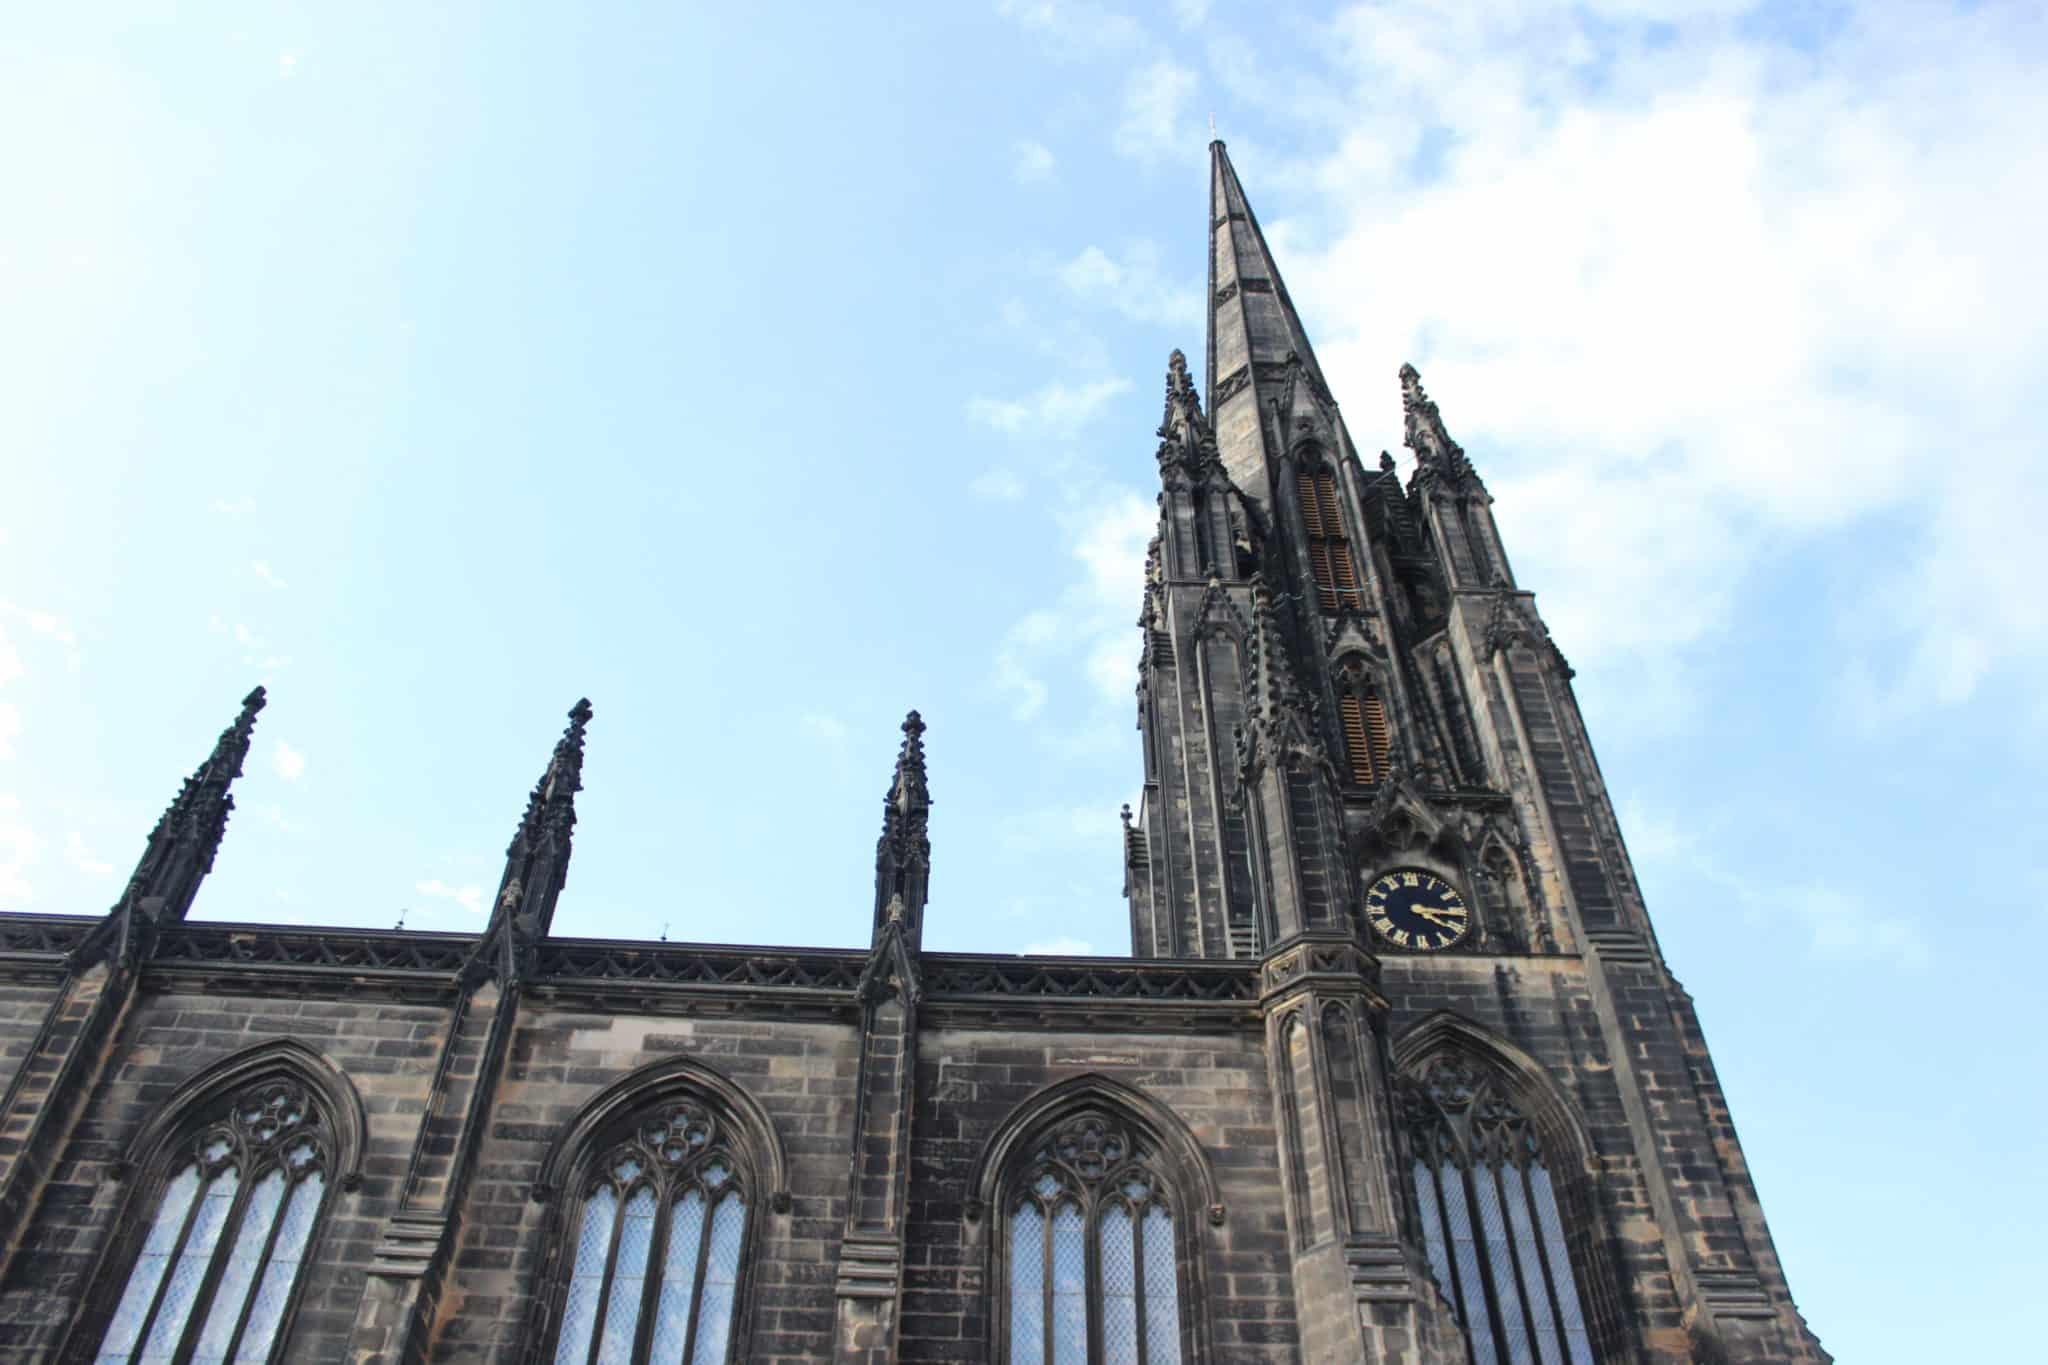 tron kirk church edinburgh scotland